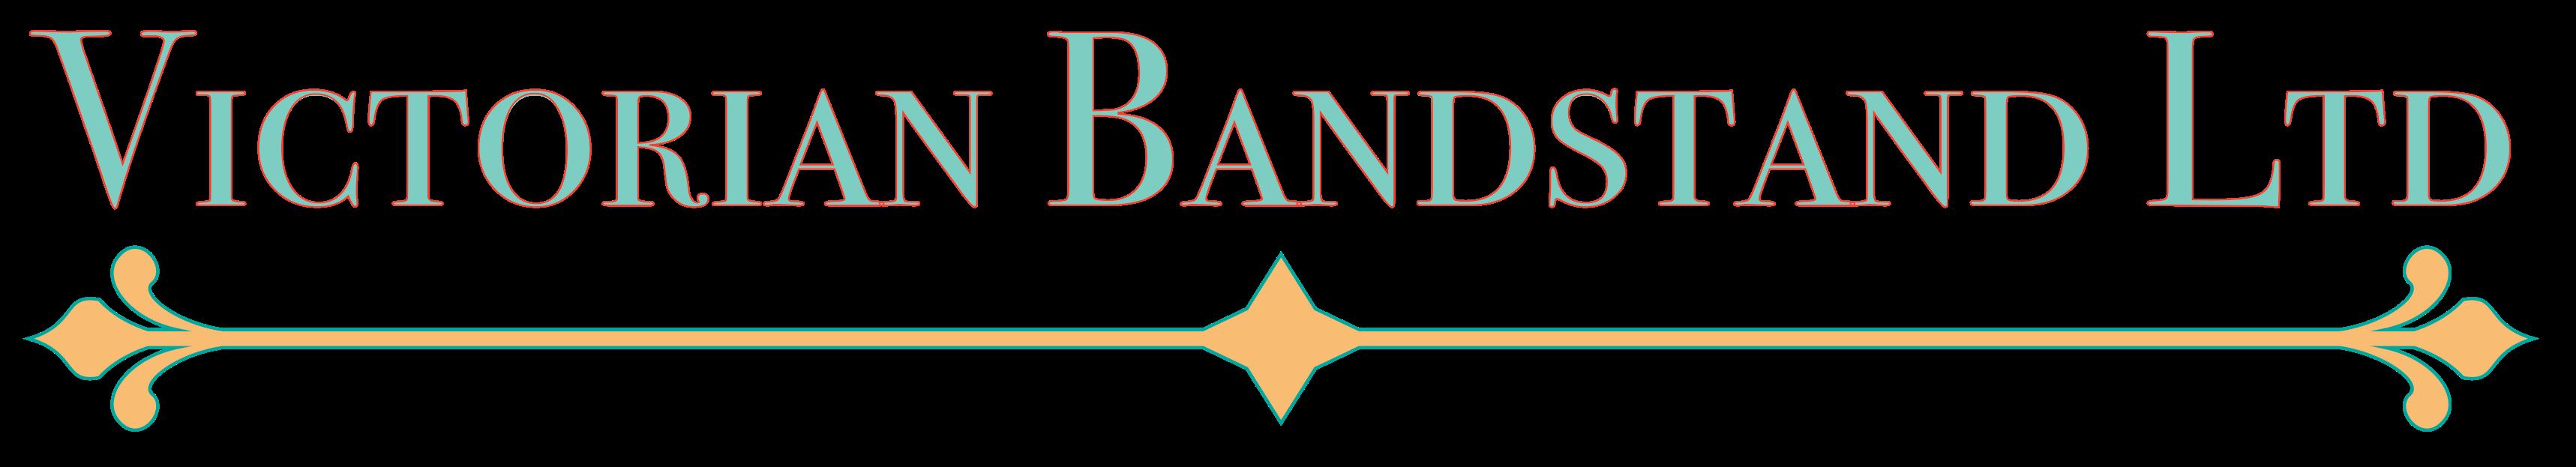 Victorian Bandstand Hire